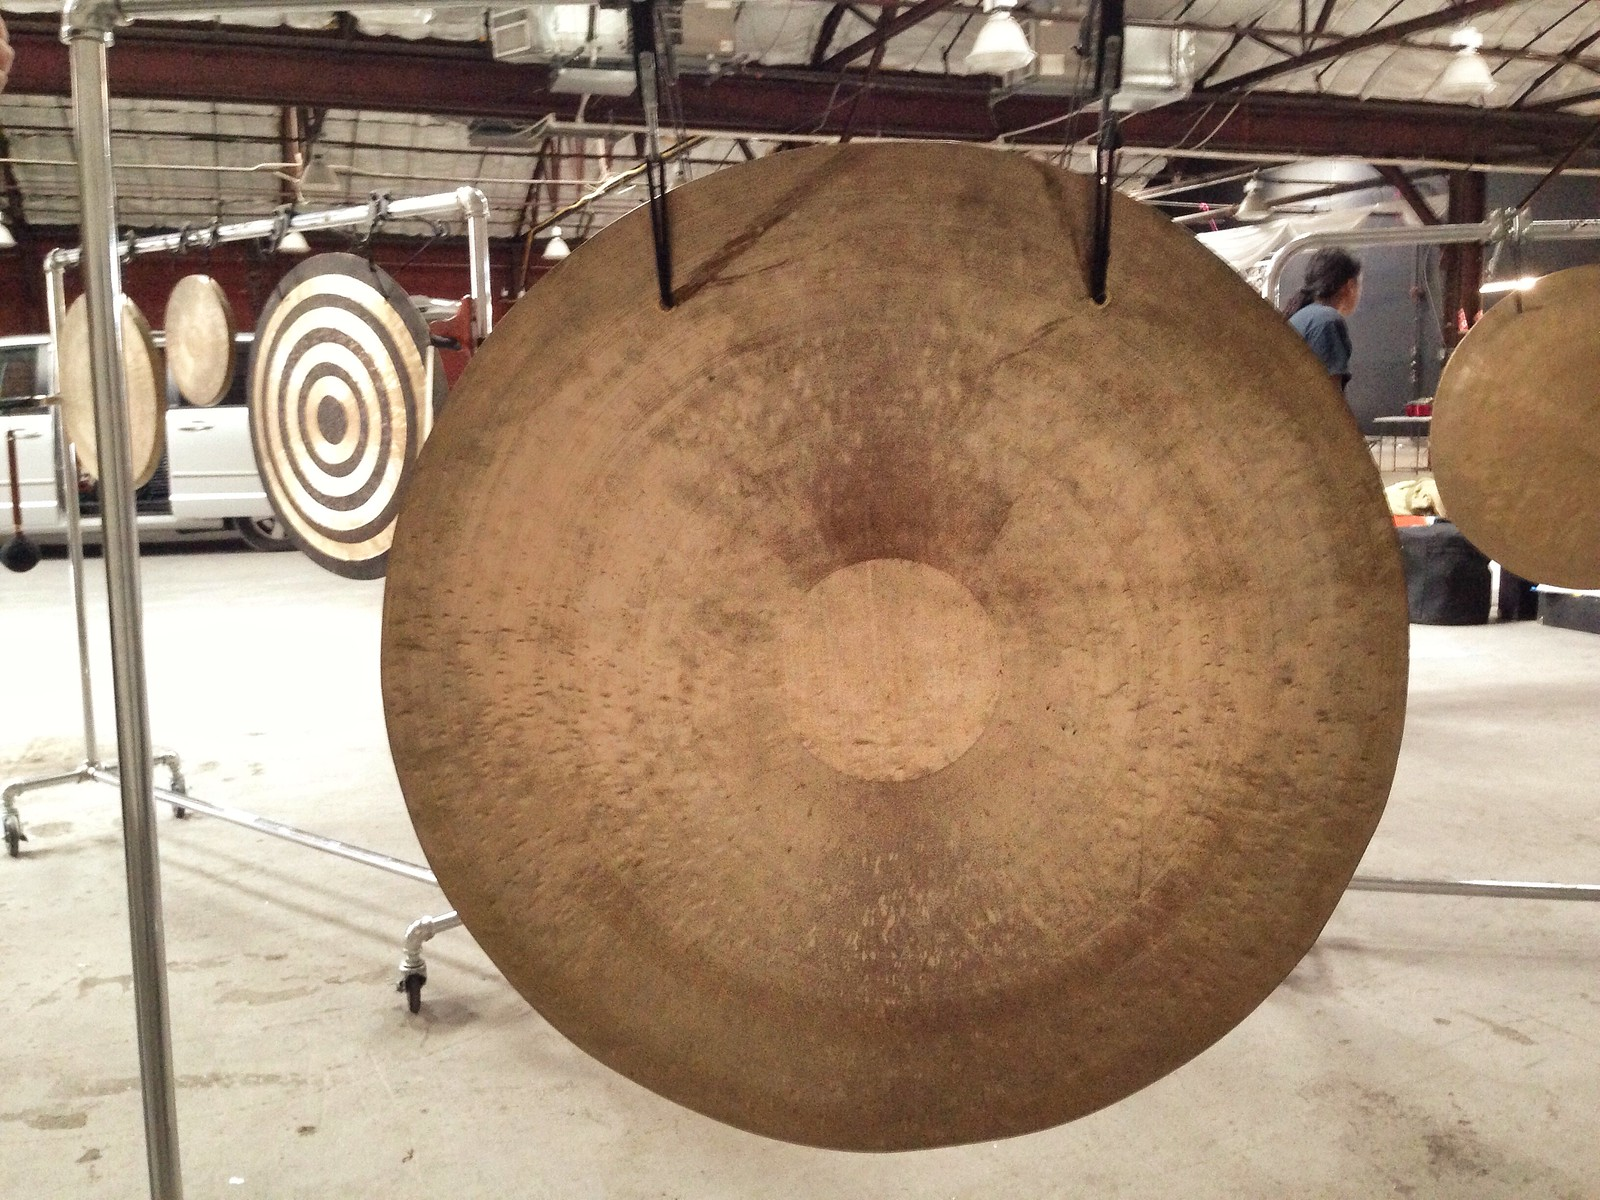 Jupiter (my gong)